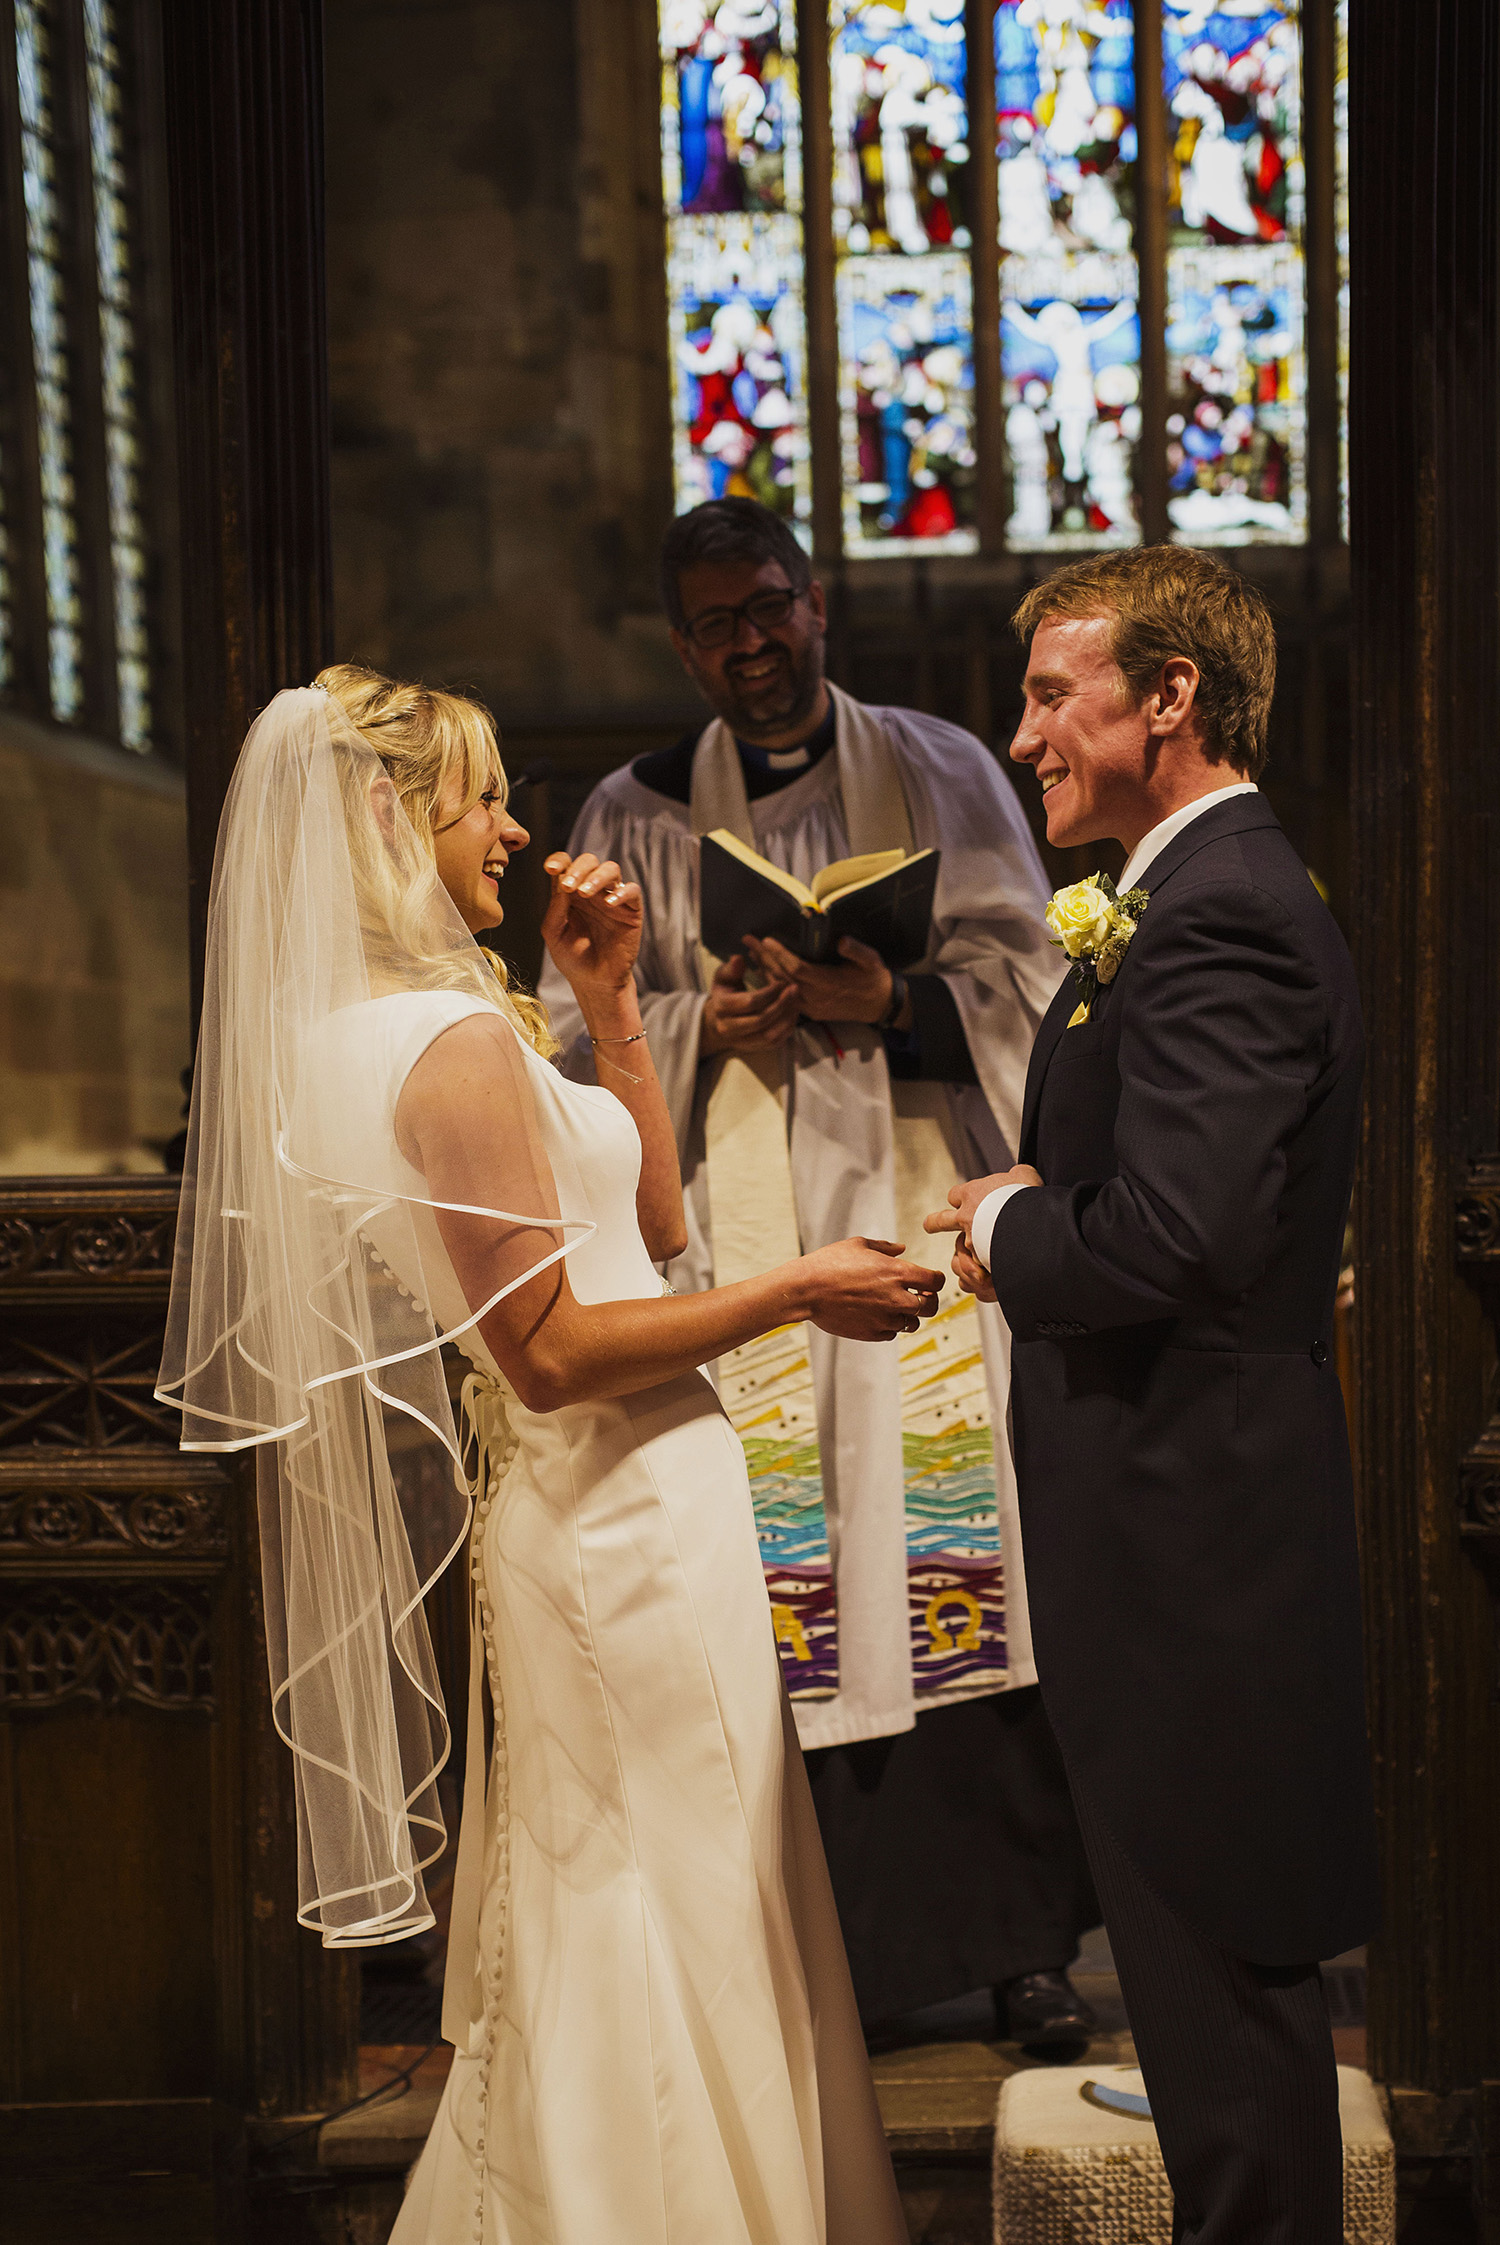 wedding ceremony at knowle parish church